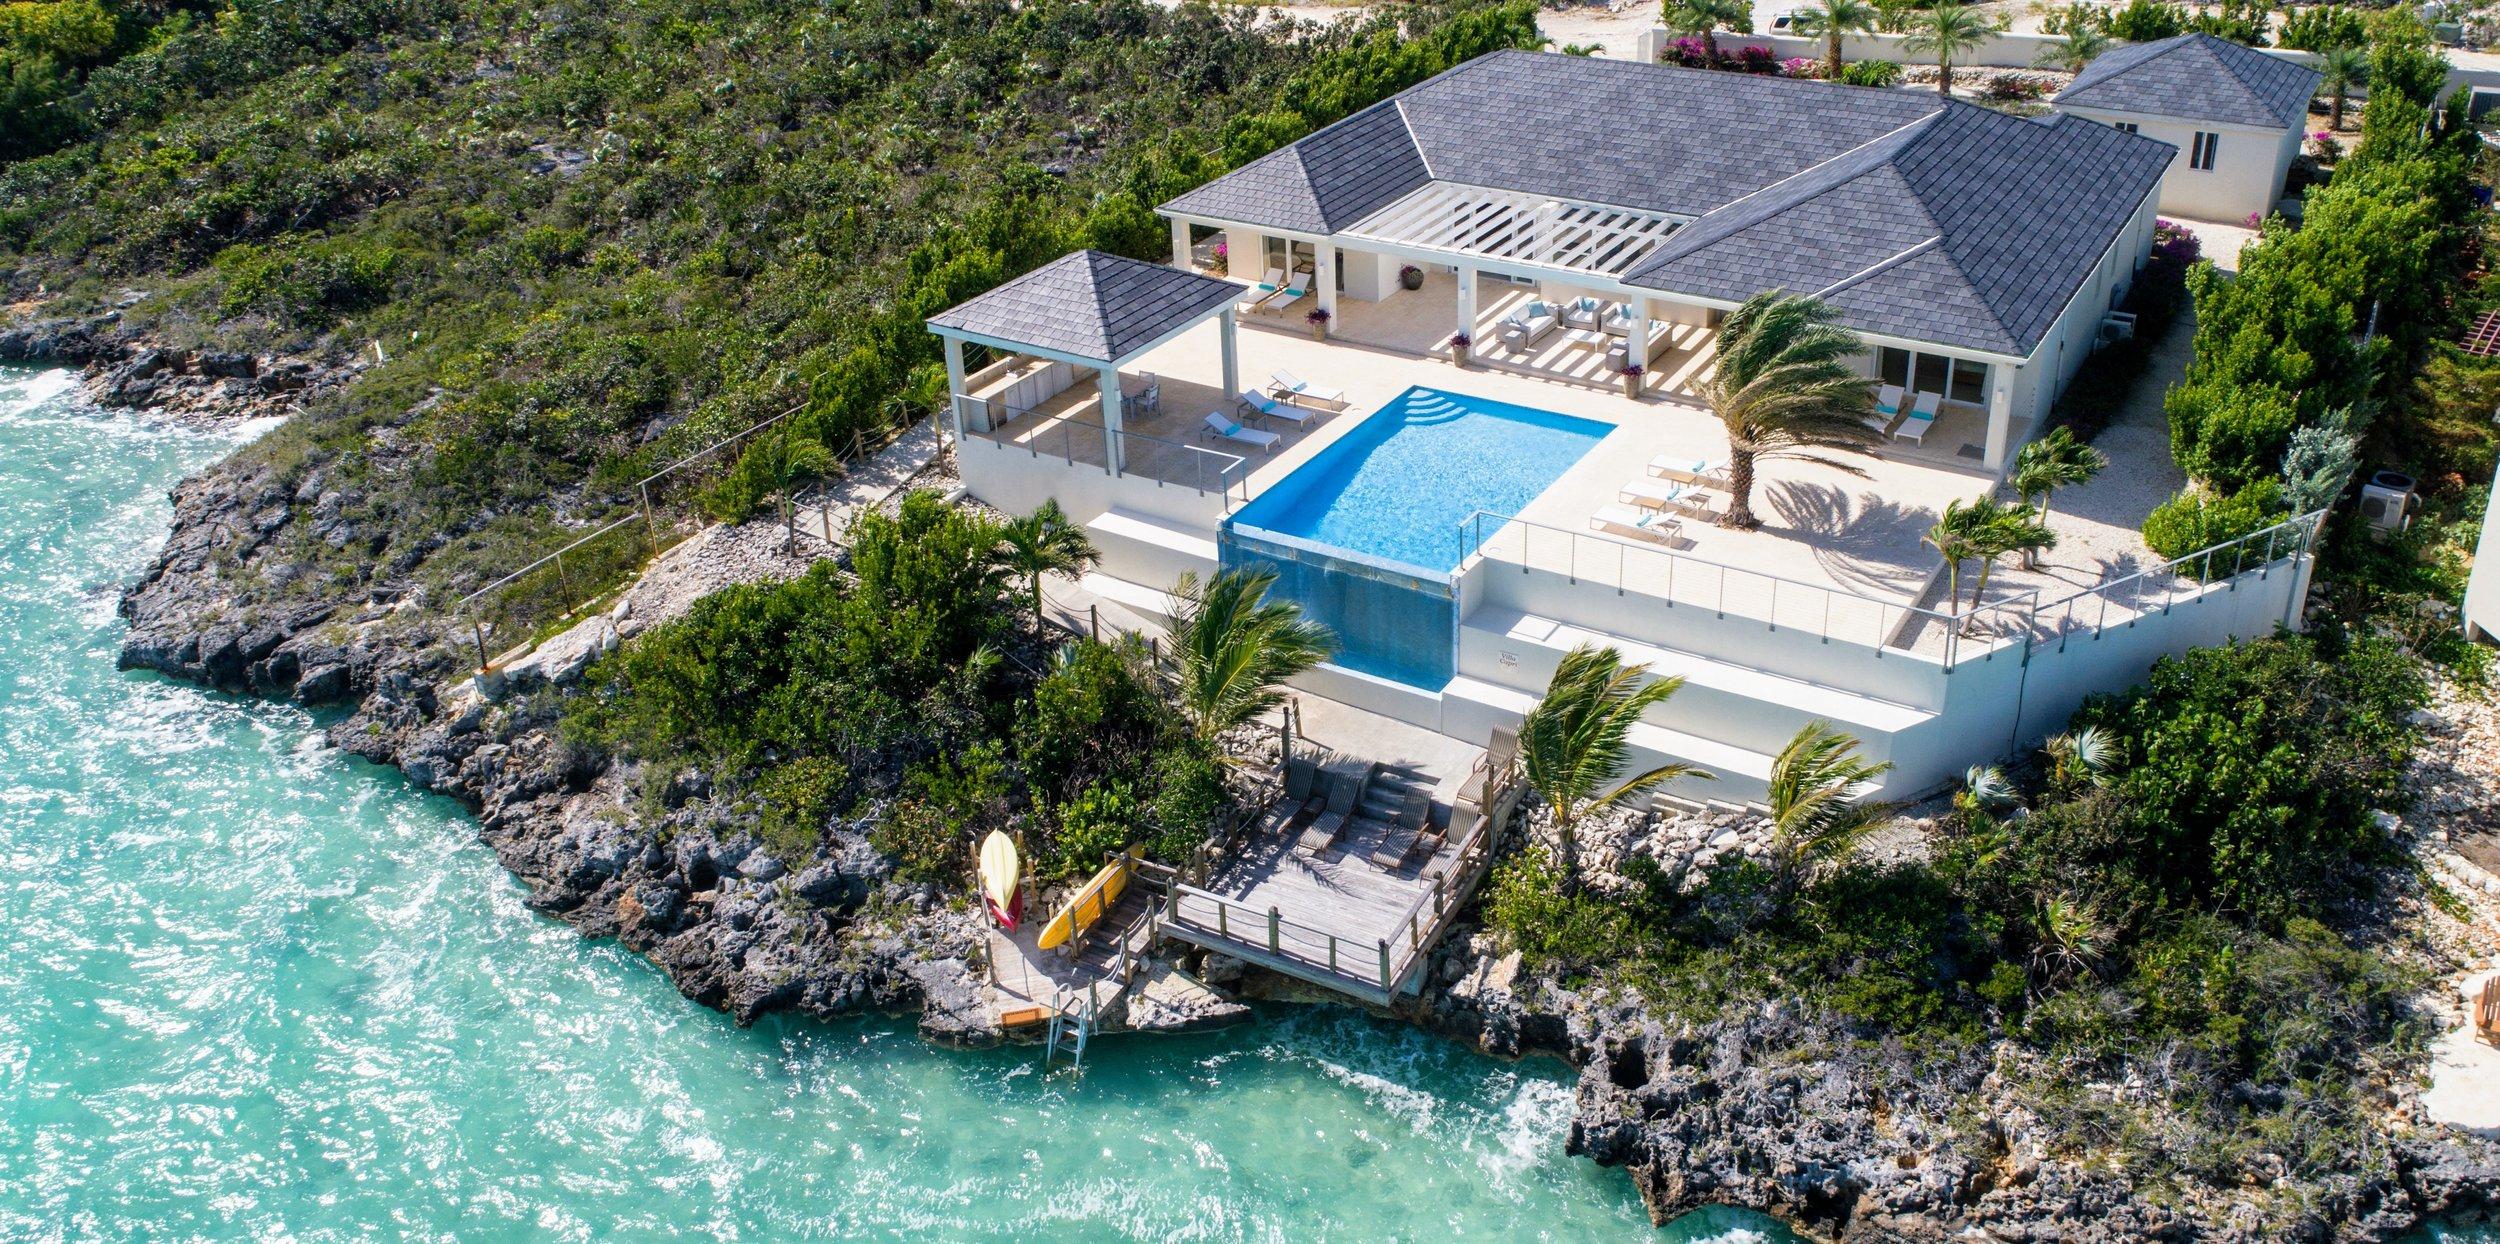 Villa Capri Turks And Caicos Islands